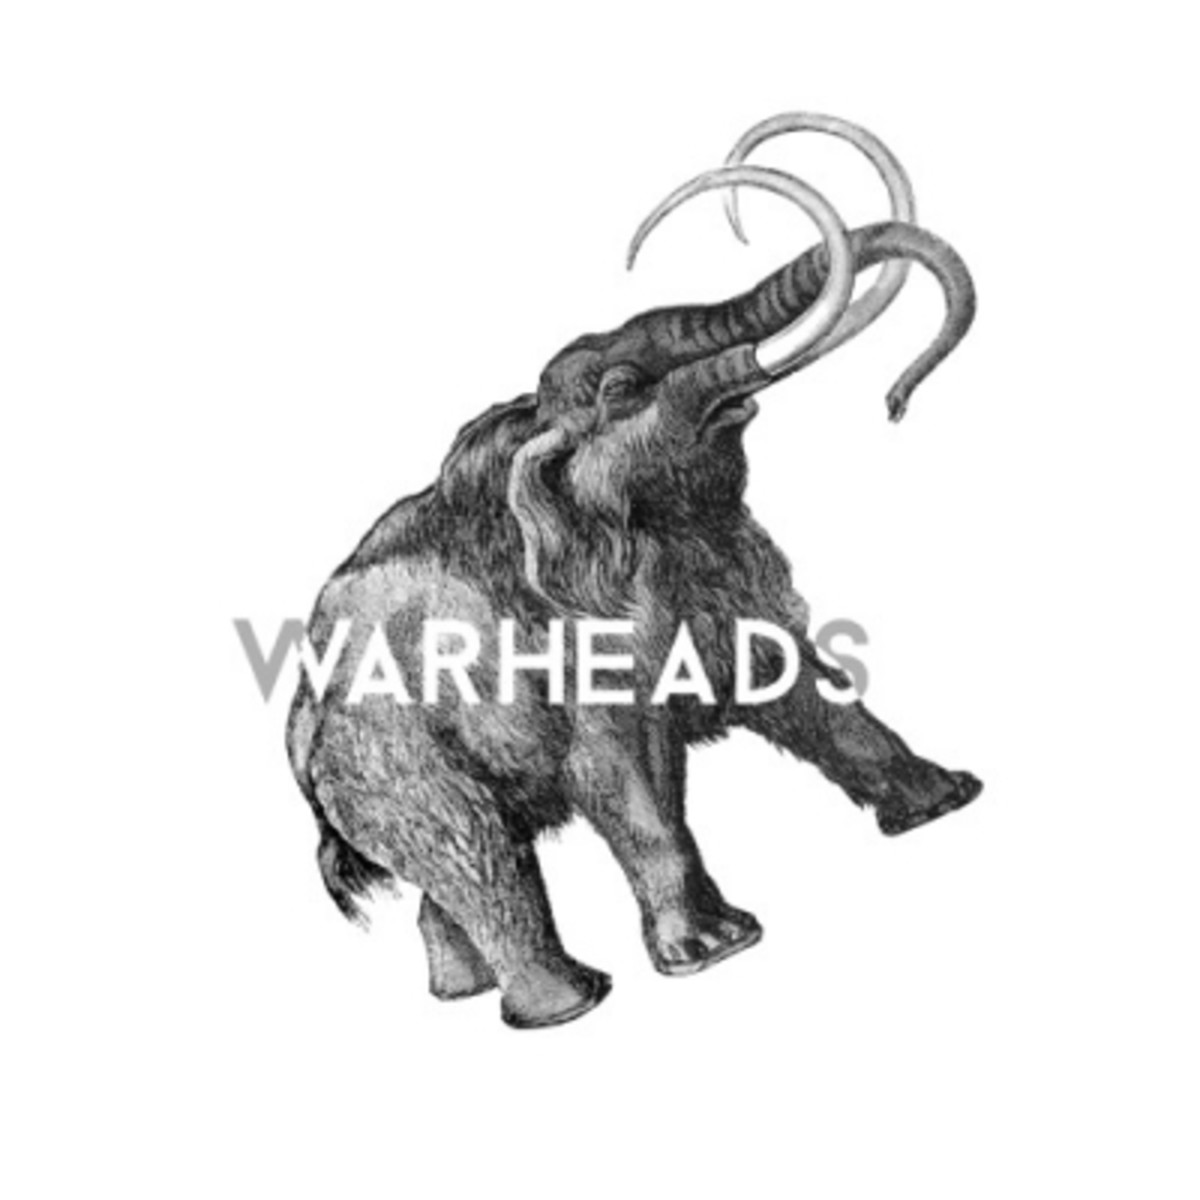 abhi-the-nomad-warheads.jpg